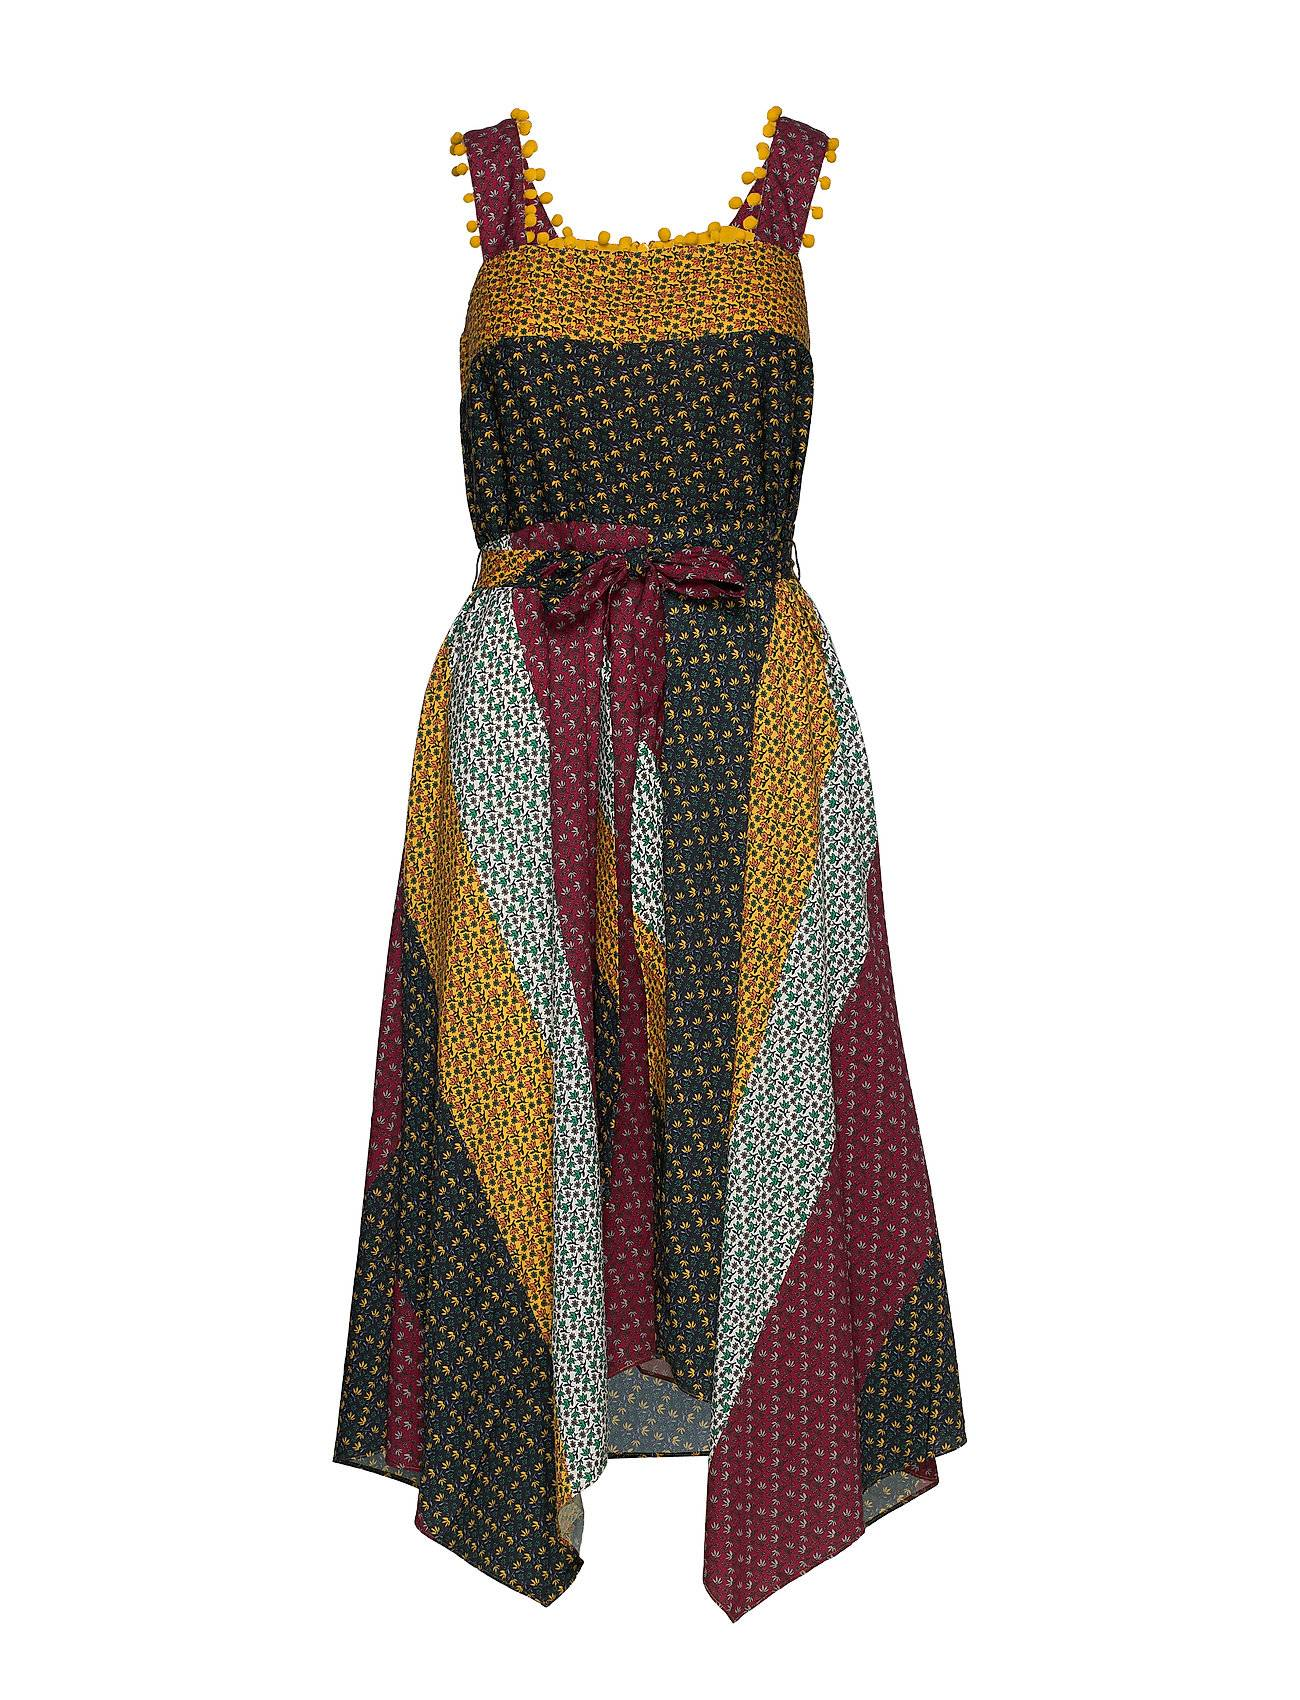 French Connection Adita Drape Mix Print Dress Polvipituinen Mekko Monivärinen/Kuvioitu French Connection